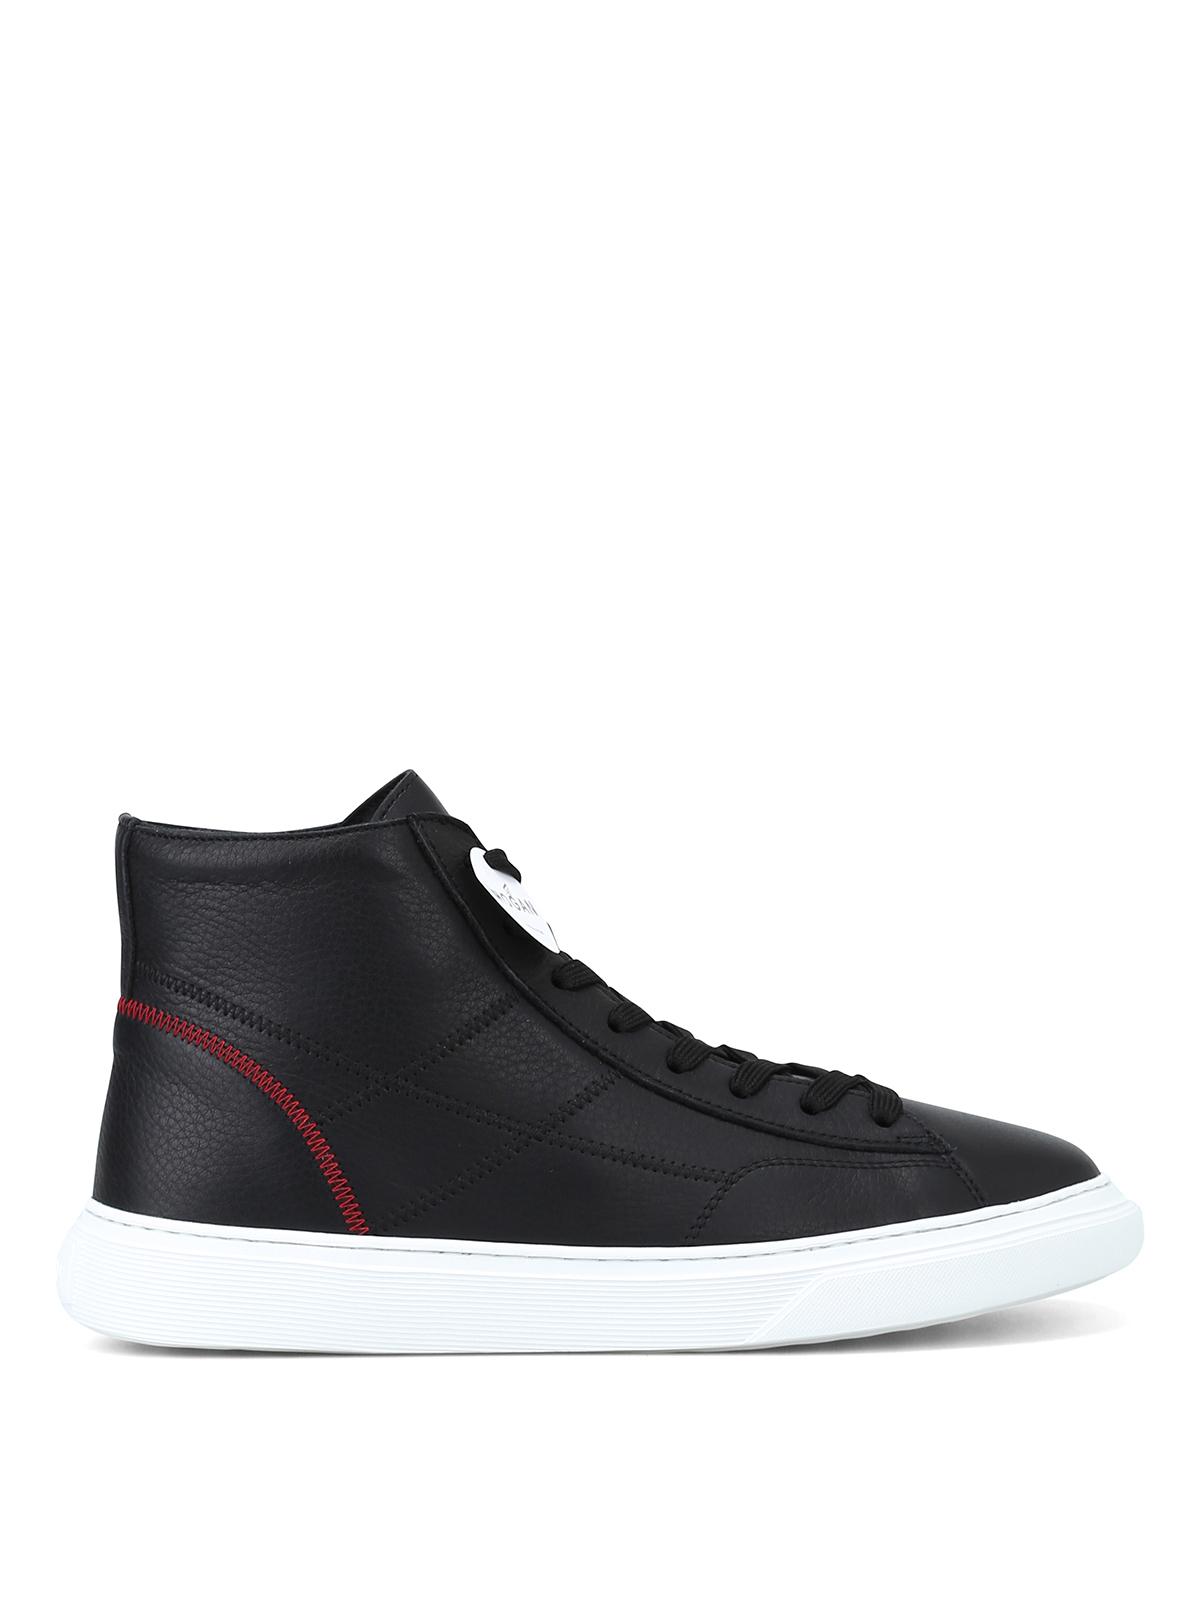 Sneakers Hogan - Sneaker alte H365 nere con impunture ...